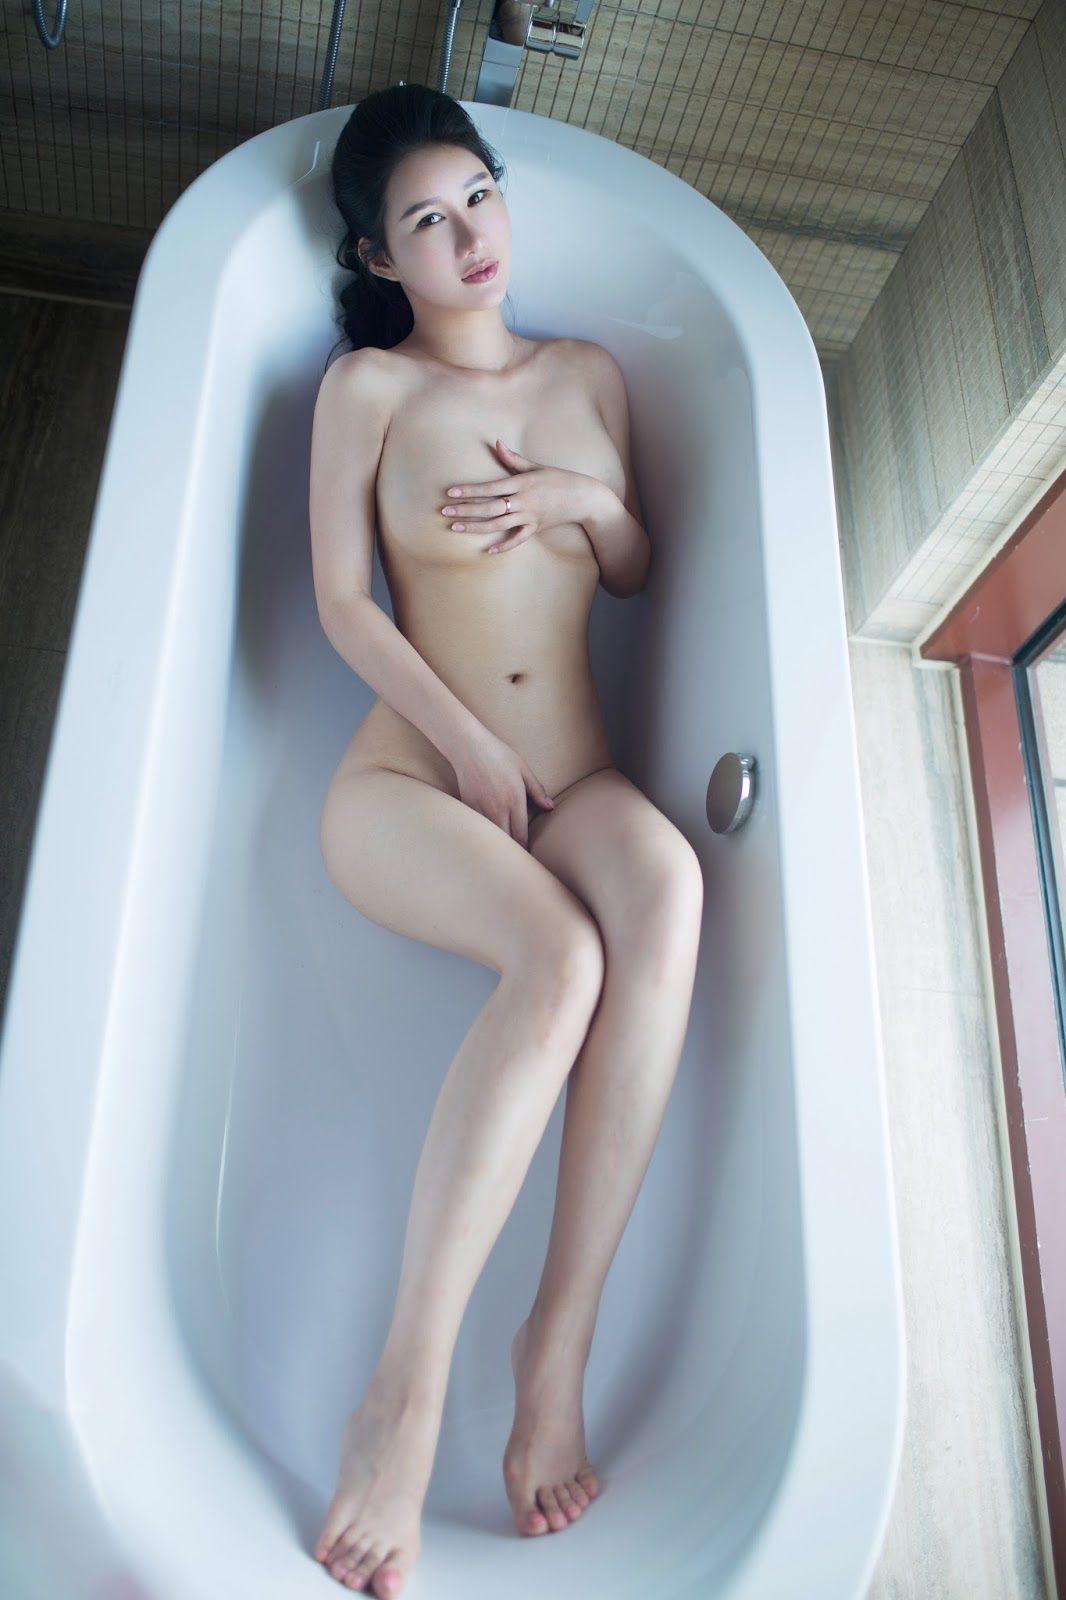 Free pics naked midget women